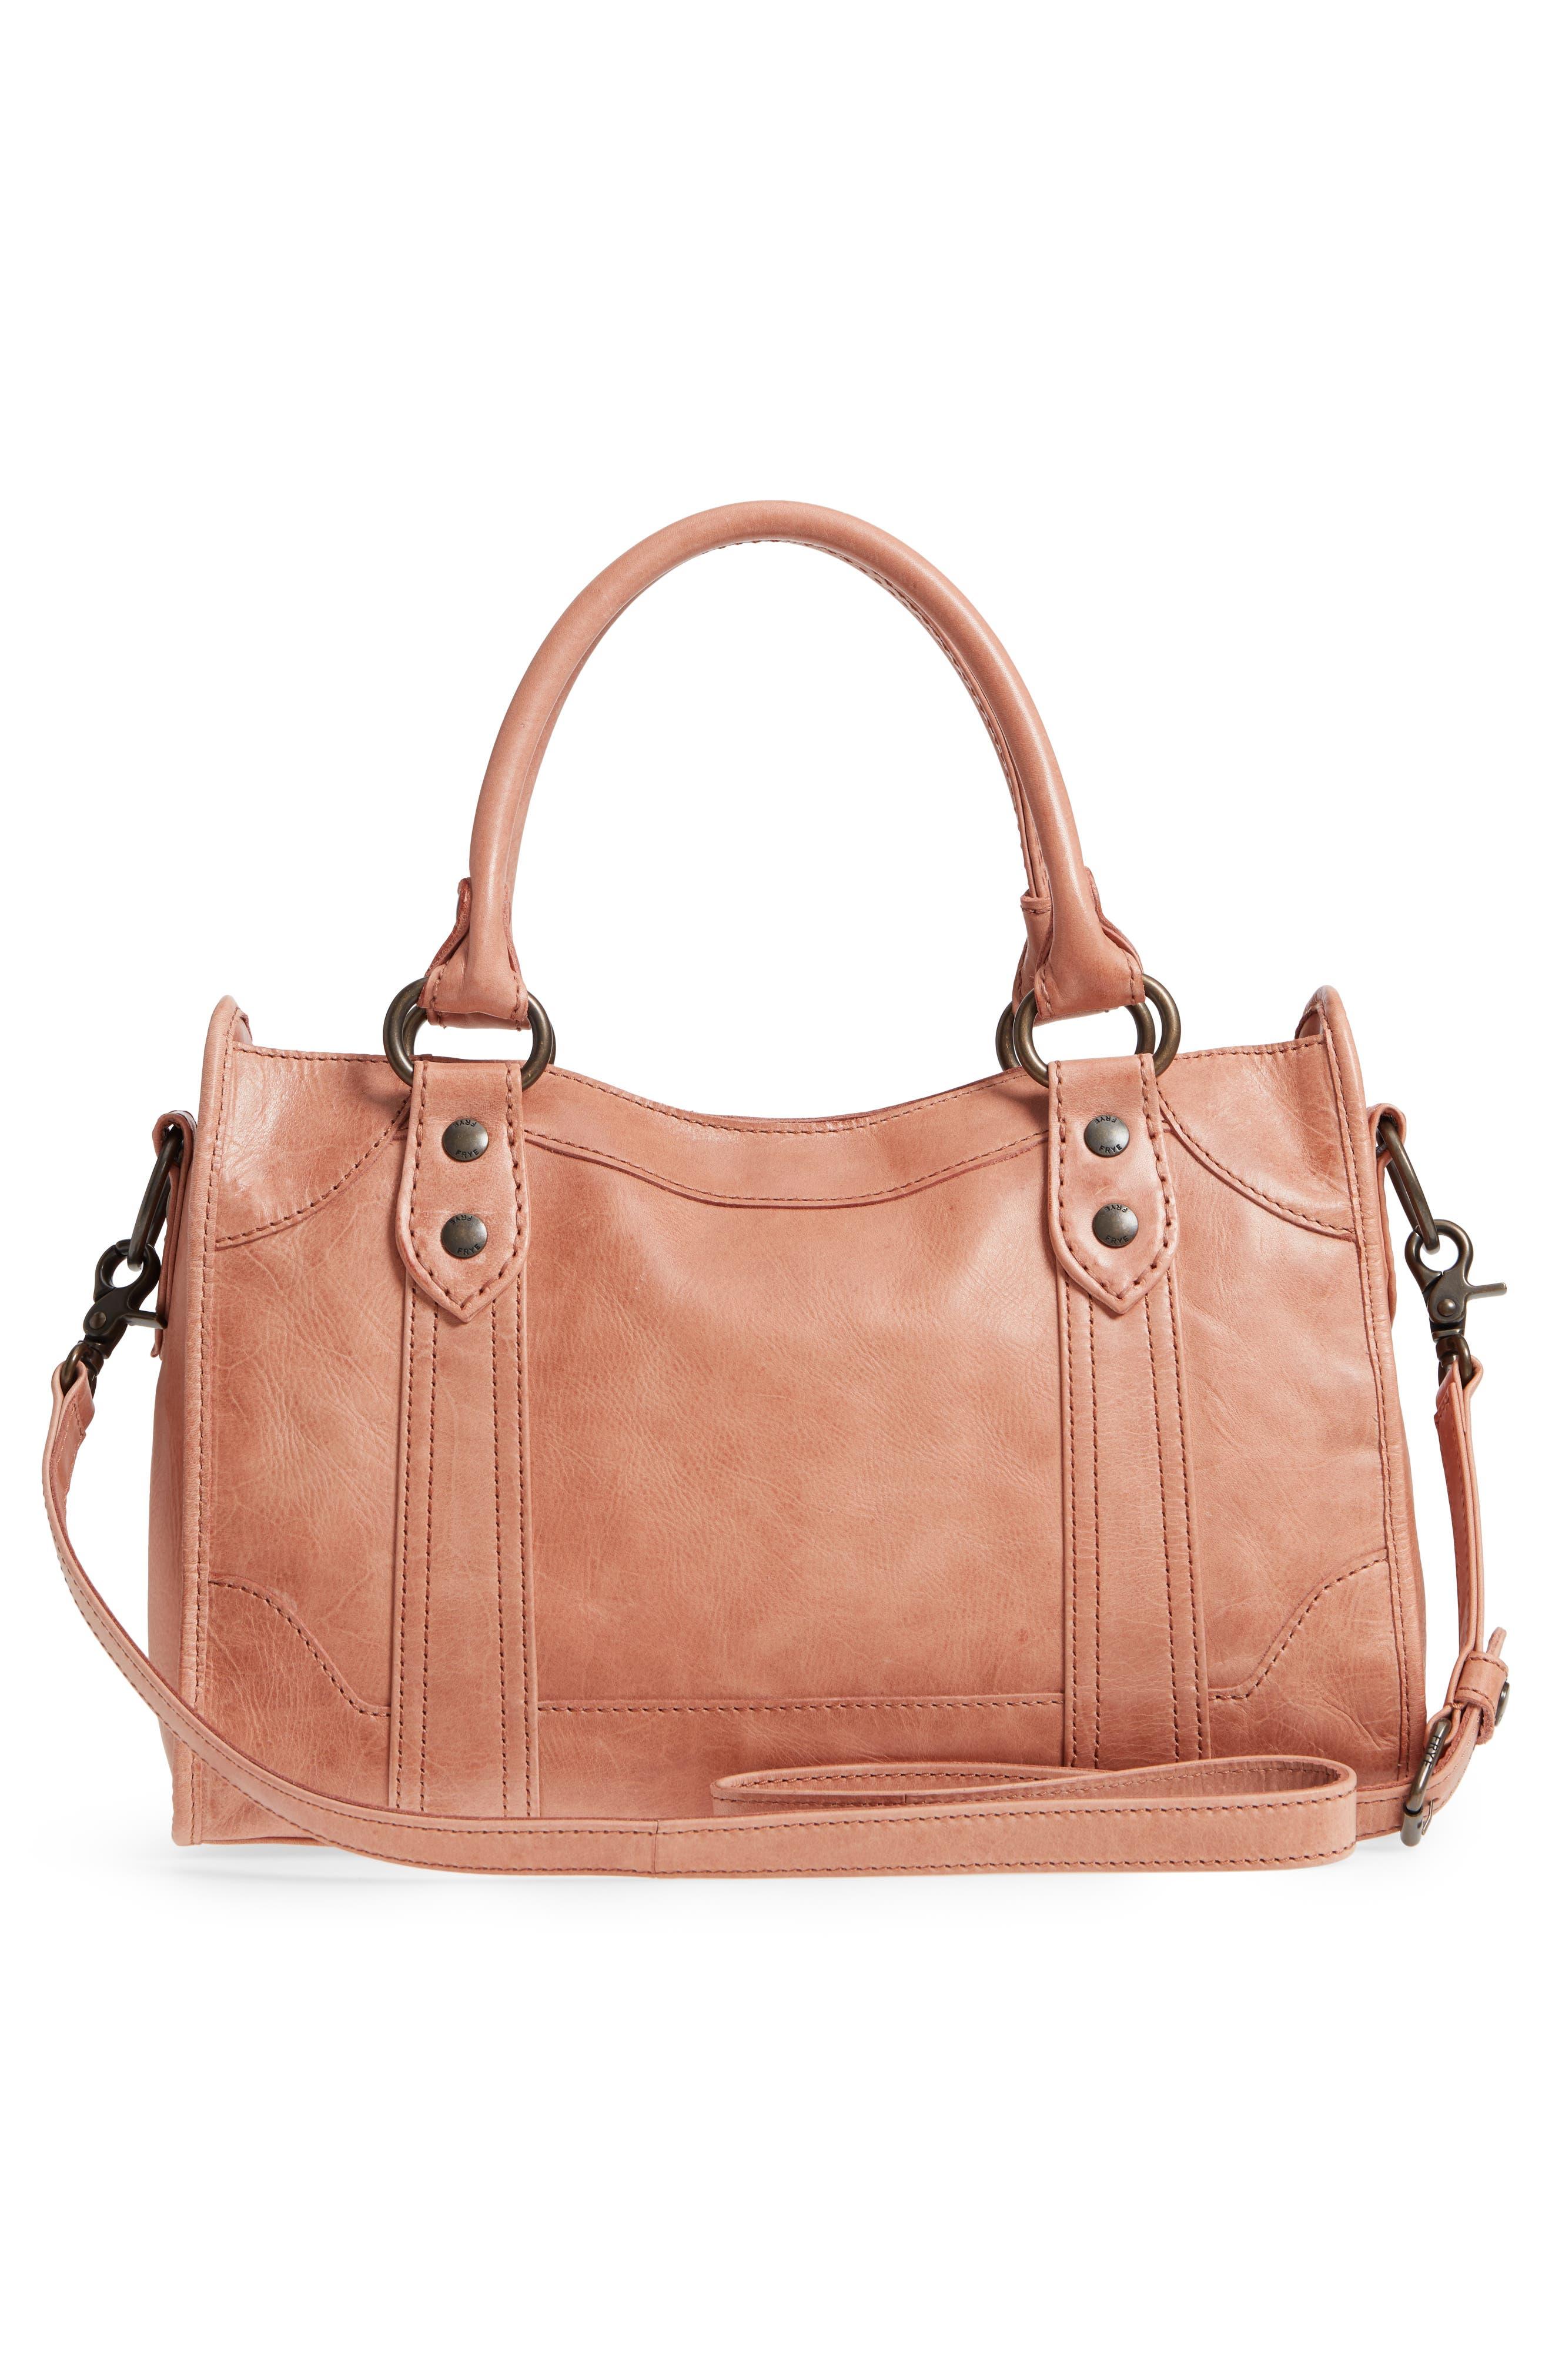 'Melissa' Washed Leather Satchel,                             Alternate thumbnail 3, color,                             DUSTY ROSE